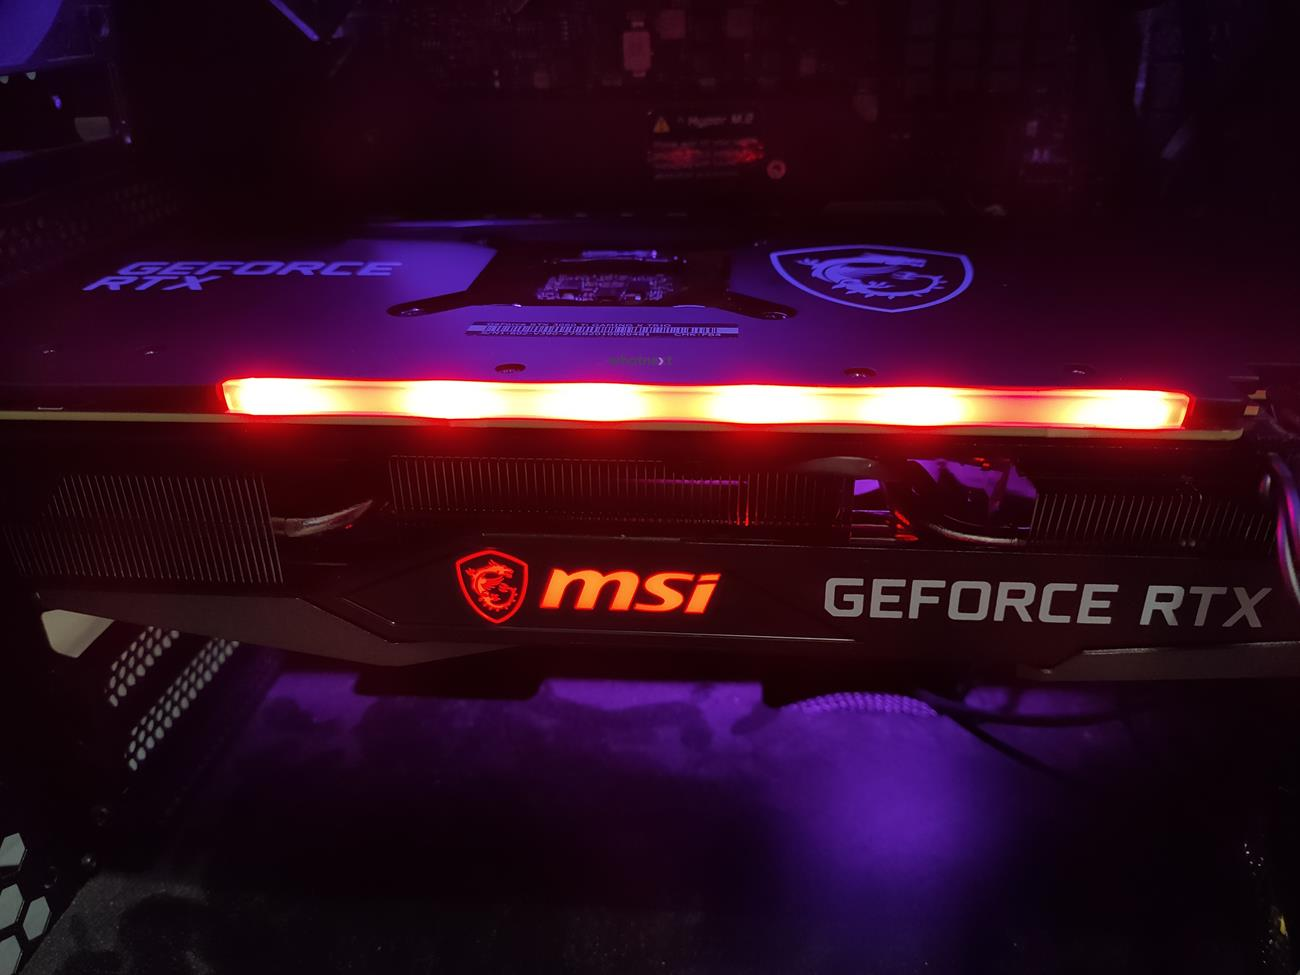 test MSI GeForce RTX 3060 Ti Gaming X Trio, recenzja MSI GeForce RTX 3060 Ti Gaming X Trio, review MSI GeForce RTX 3060 Ti Gaming X Trio, opinia MSI GeForce RTX 3060 Ti Gaming X Trio,